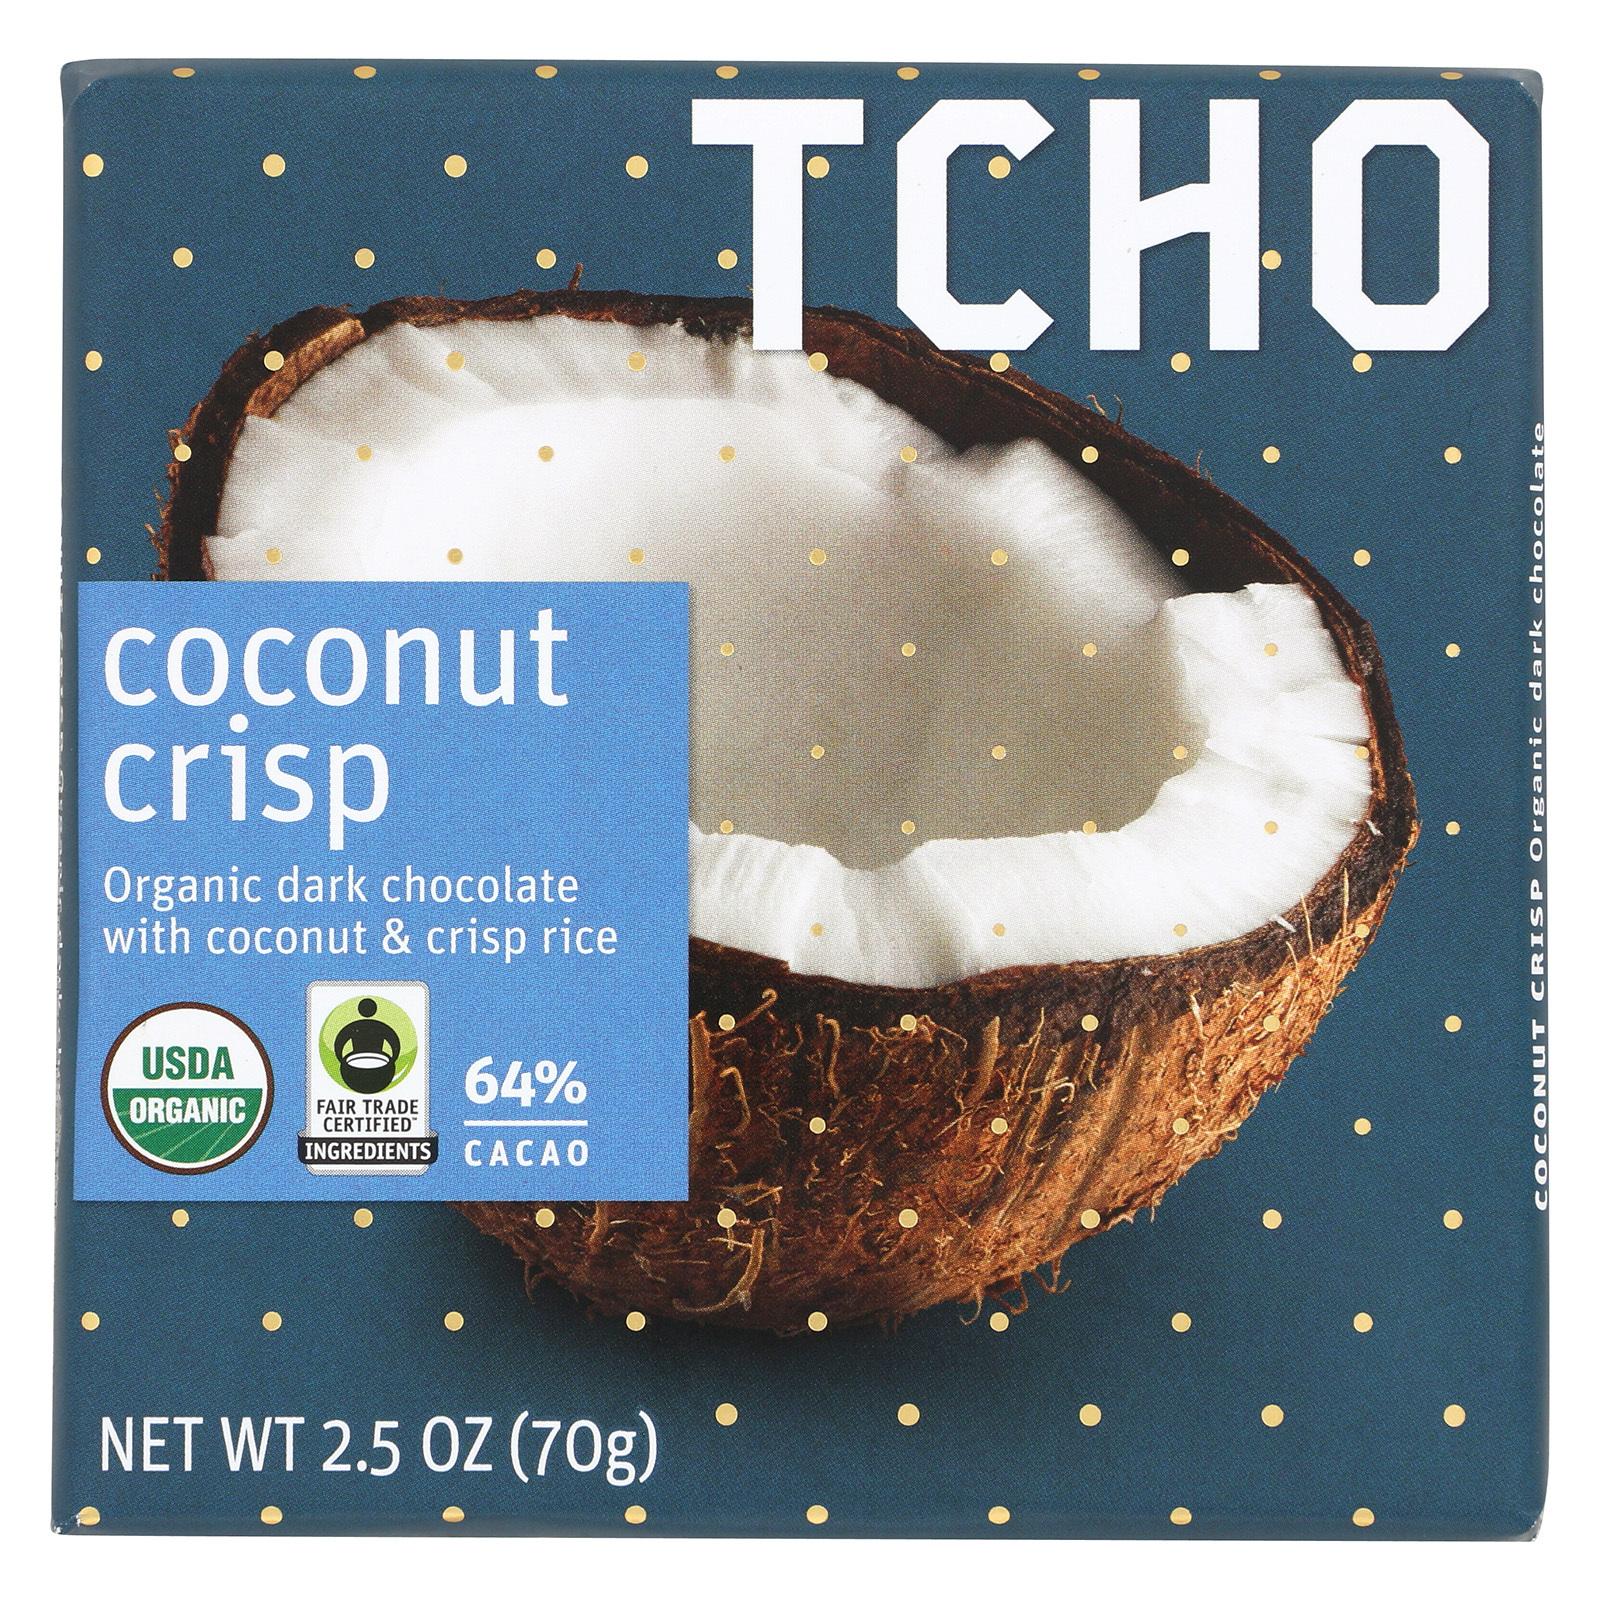 Tcho Chocolate Dark Chocolate Bar - Coconut Crisp 64 Percent Cacao - Case of 12 - 2.5 oz.